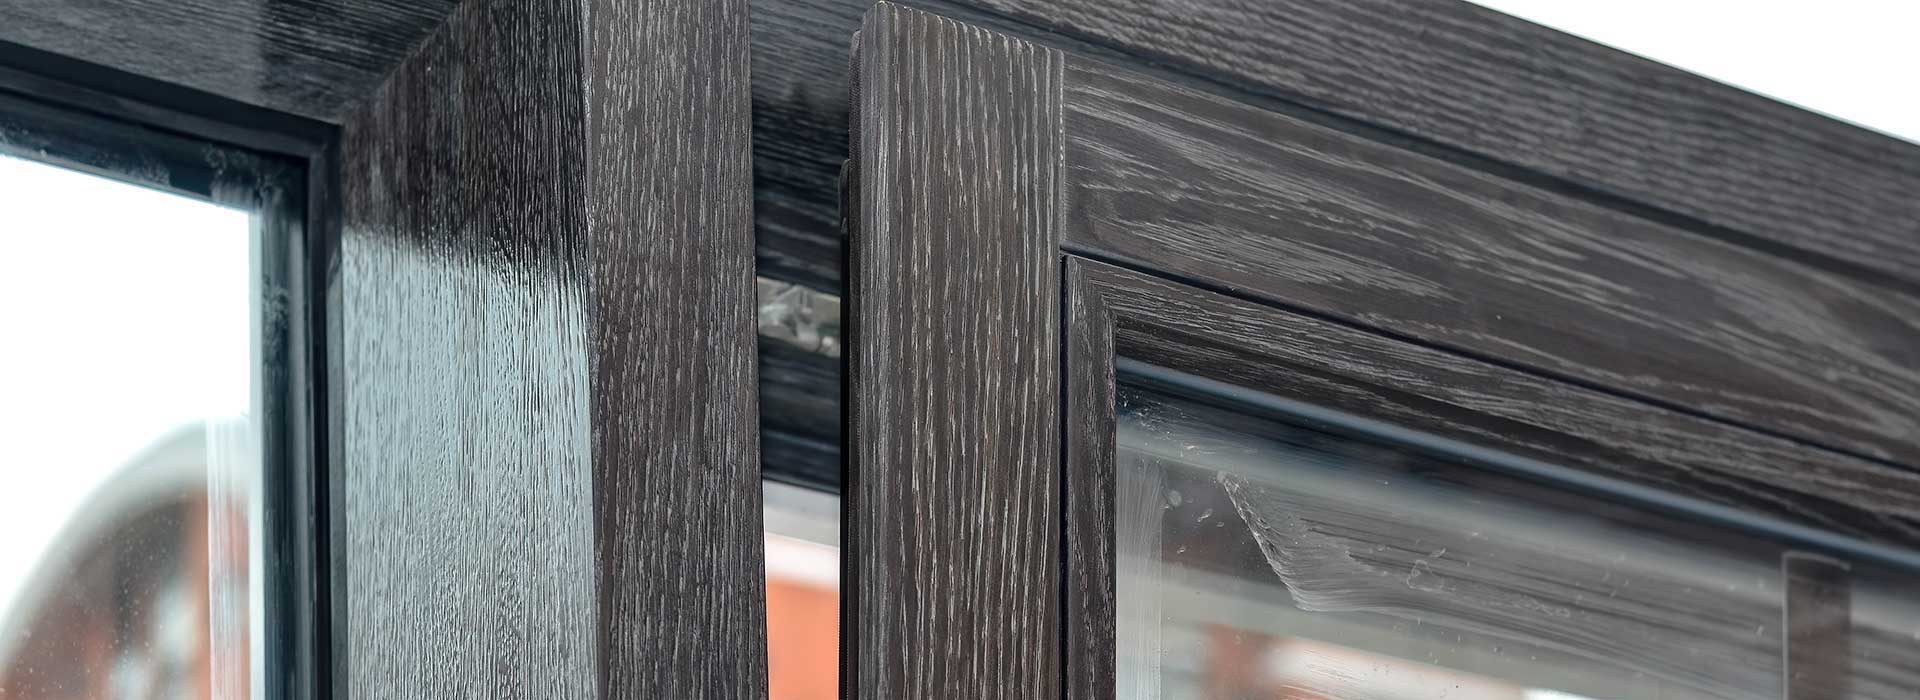 ostekleniya-oknami-i-fasadnoj-konstrukciej-iz-duba